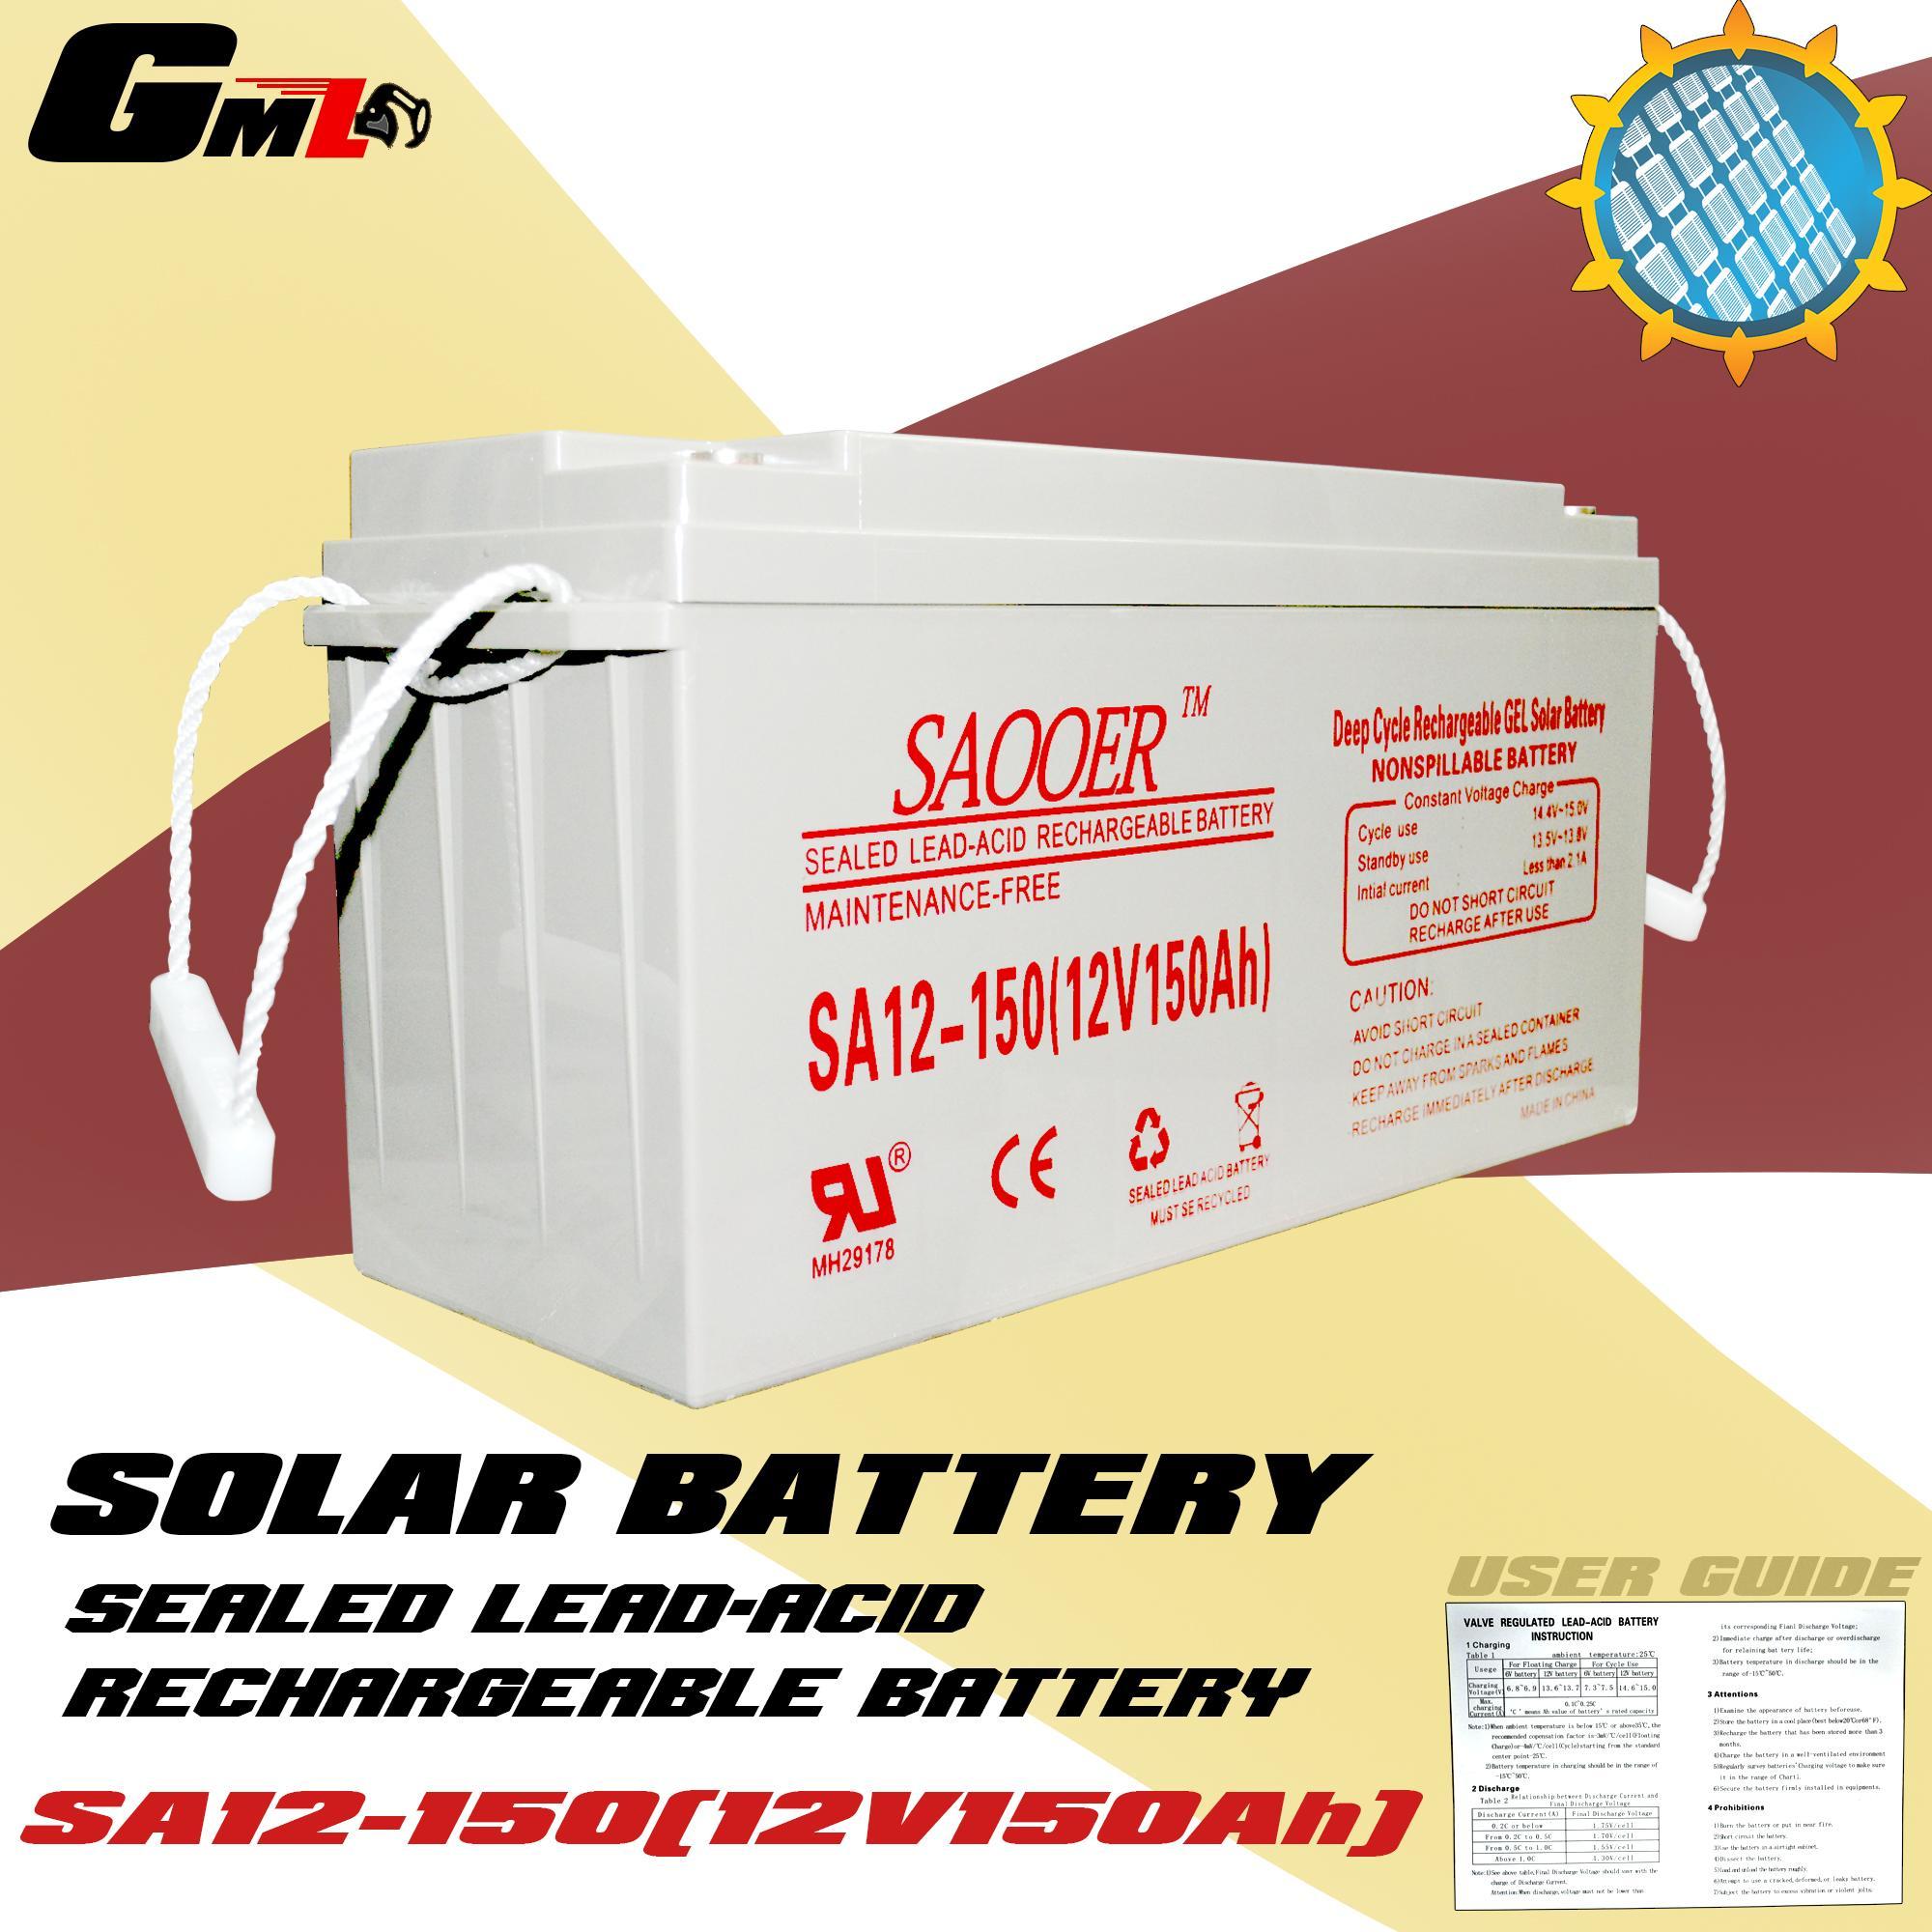 Solar Philippines Price List Led Light Set For Sale Lazada Christmas Lights Circuit 555 Aquarium Lighting New Sa12 15012v150ah Saooer Sealed Lead Acid Rechargeable Battery